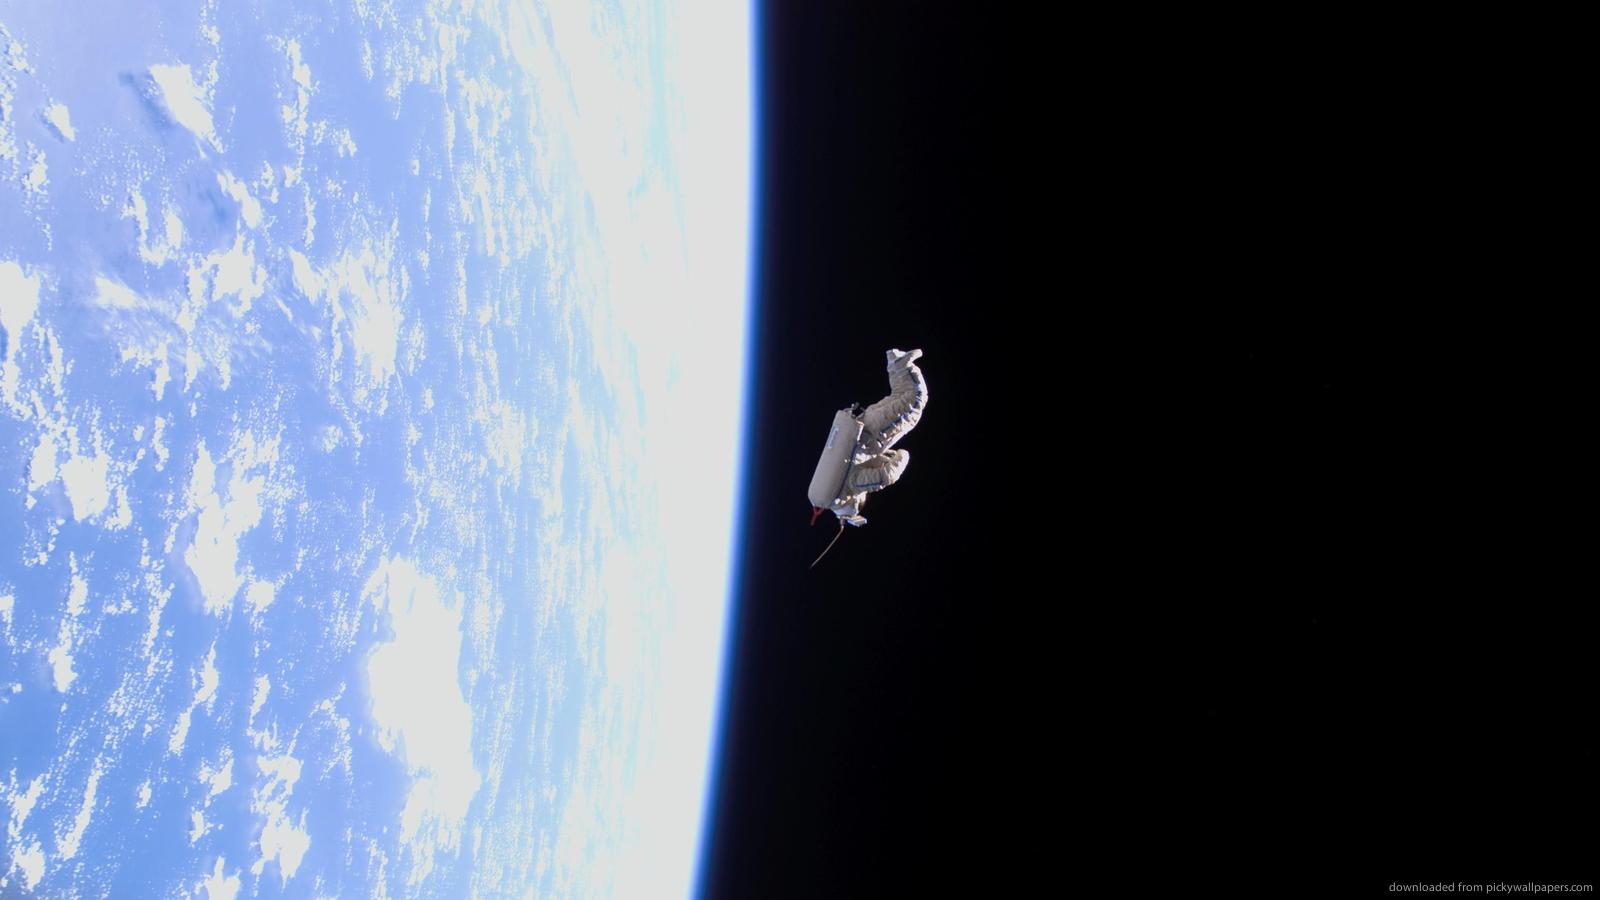 Astronauts in space wallpaper wallpapersafari - Space wallpaper 1600x900 ...